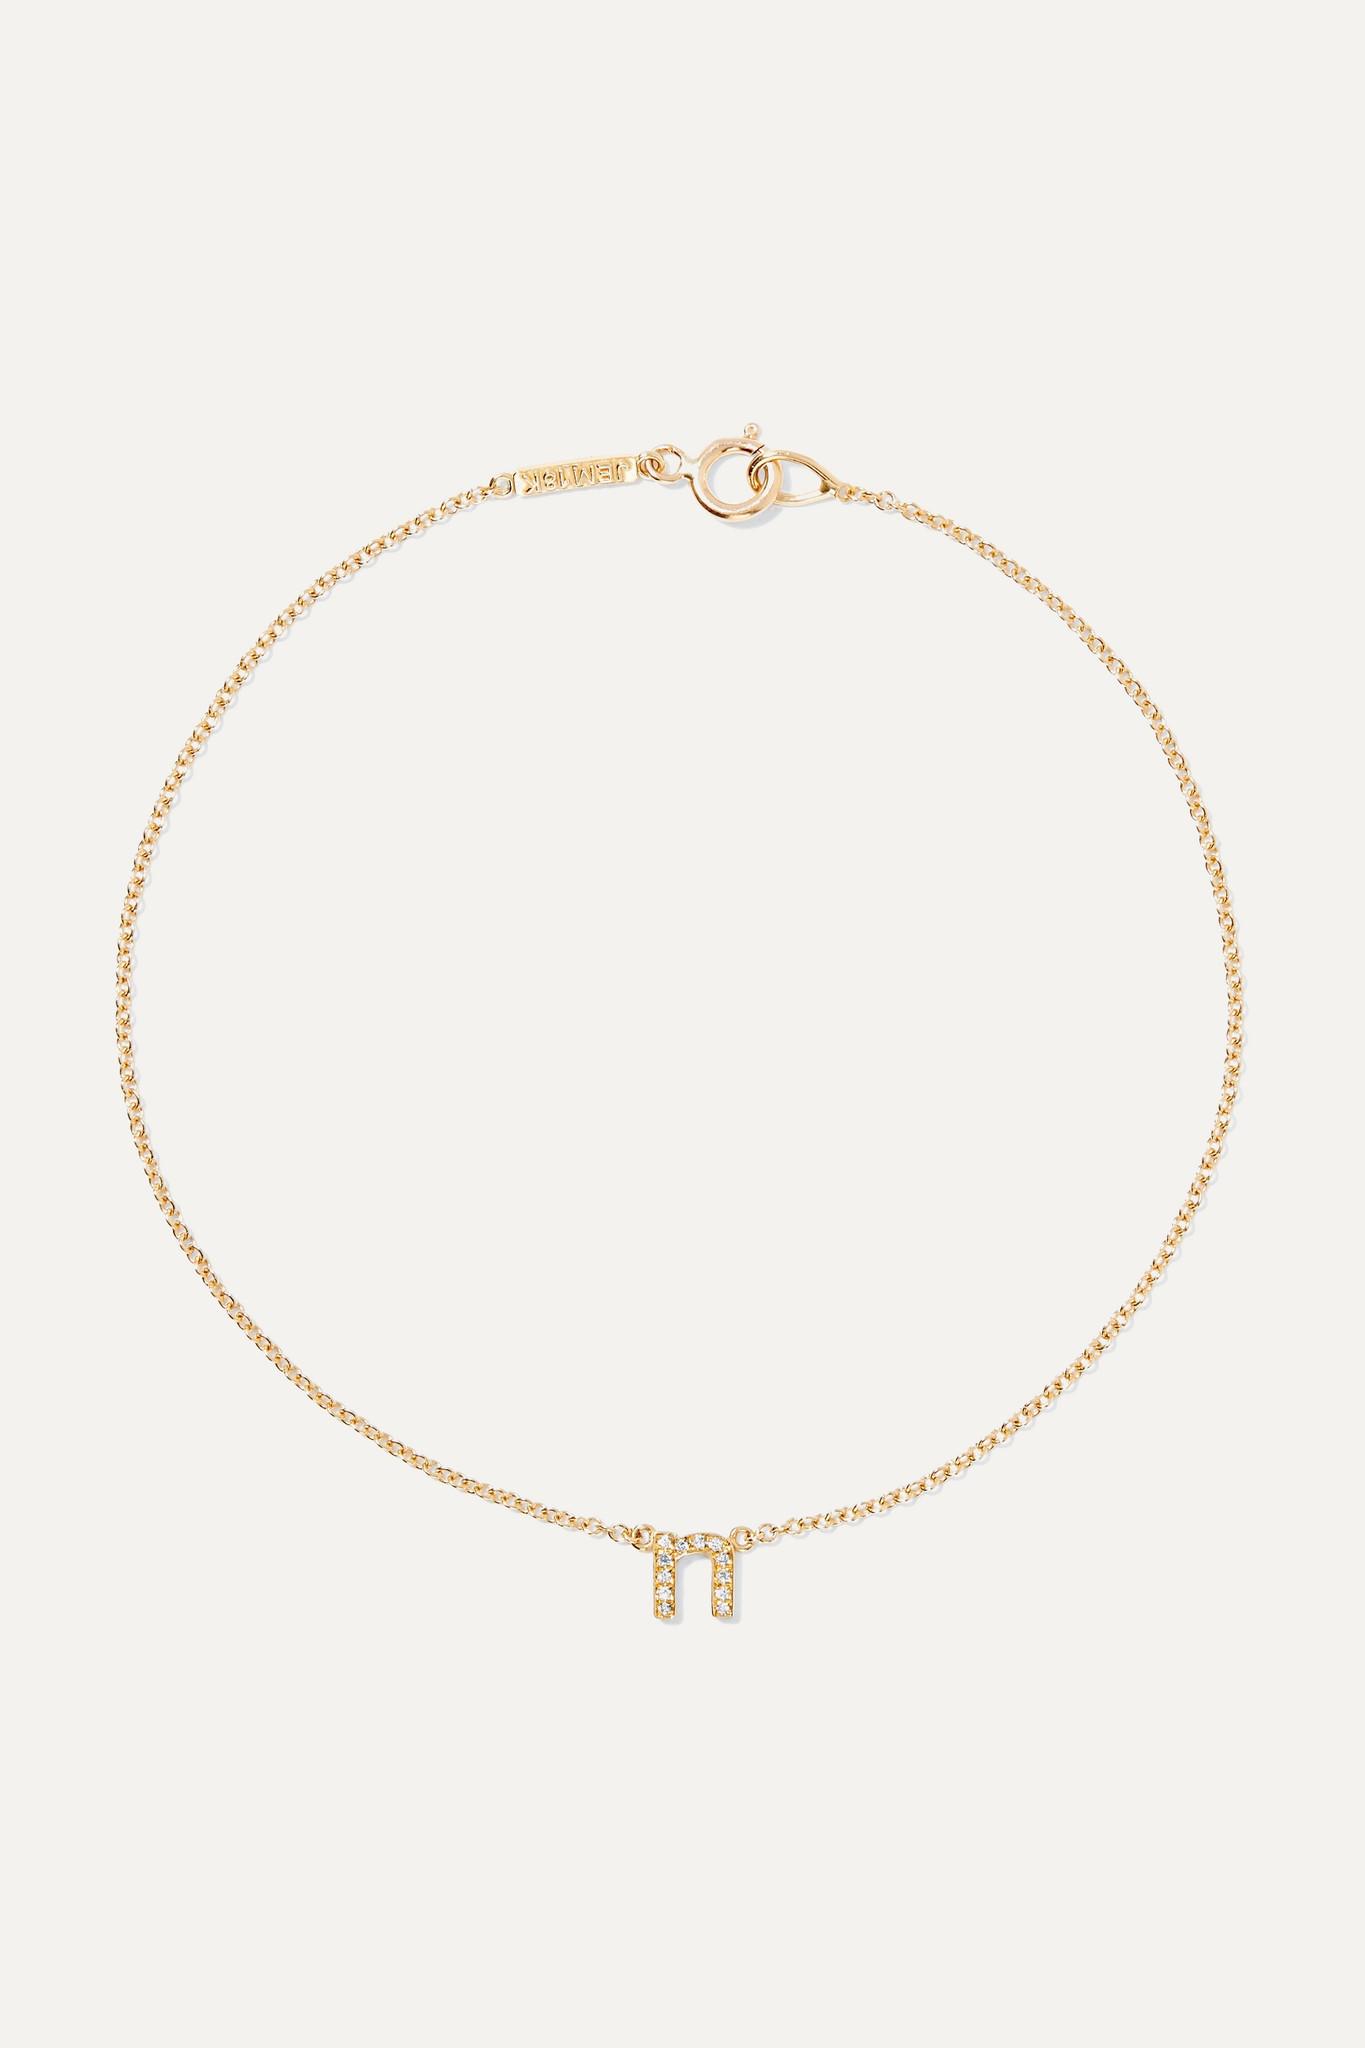 JENNIFER MEYER - Letter 18k 黄金钻石手链 - 金色 - C